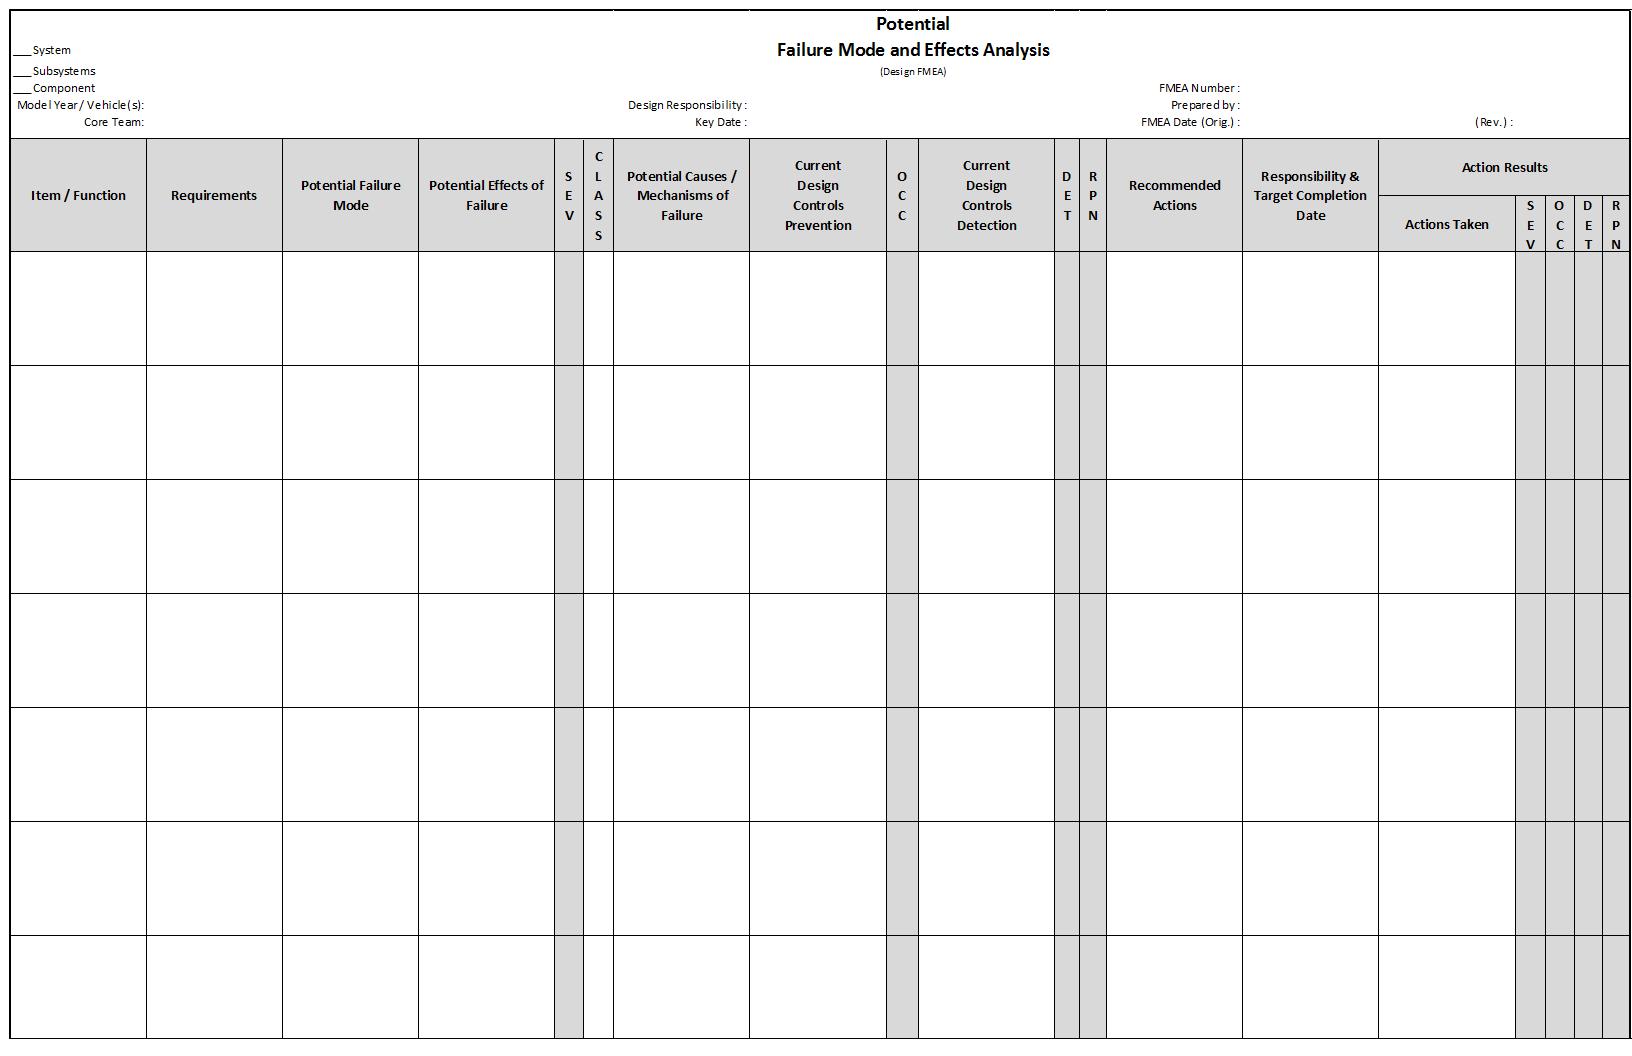 Fmea  Failure Mode And Effects Analysis  Qualityone Inside Fmea Sample Worksheet